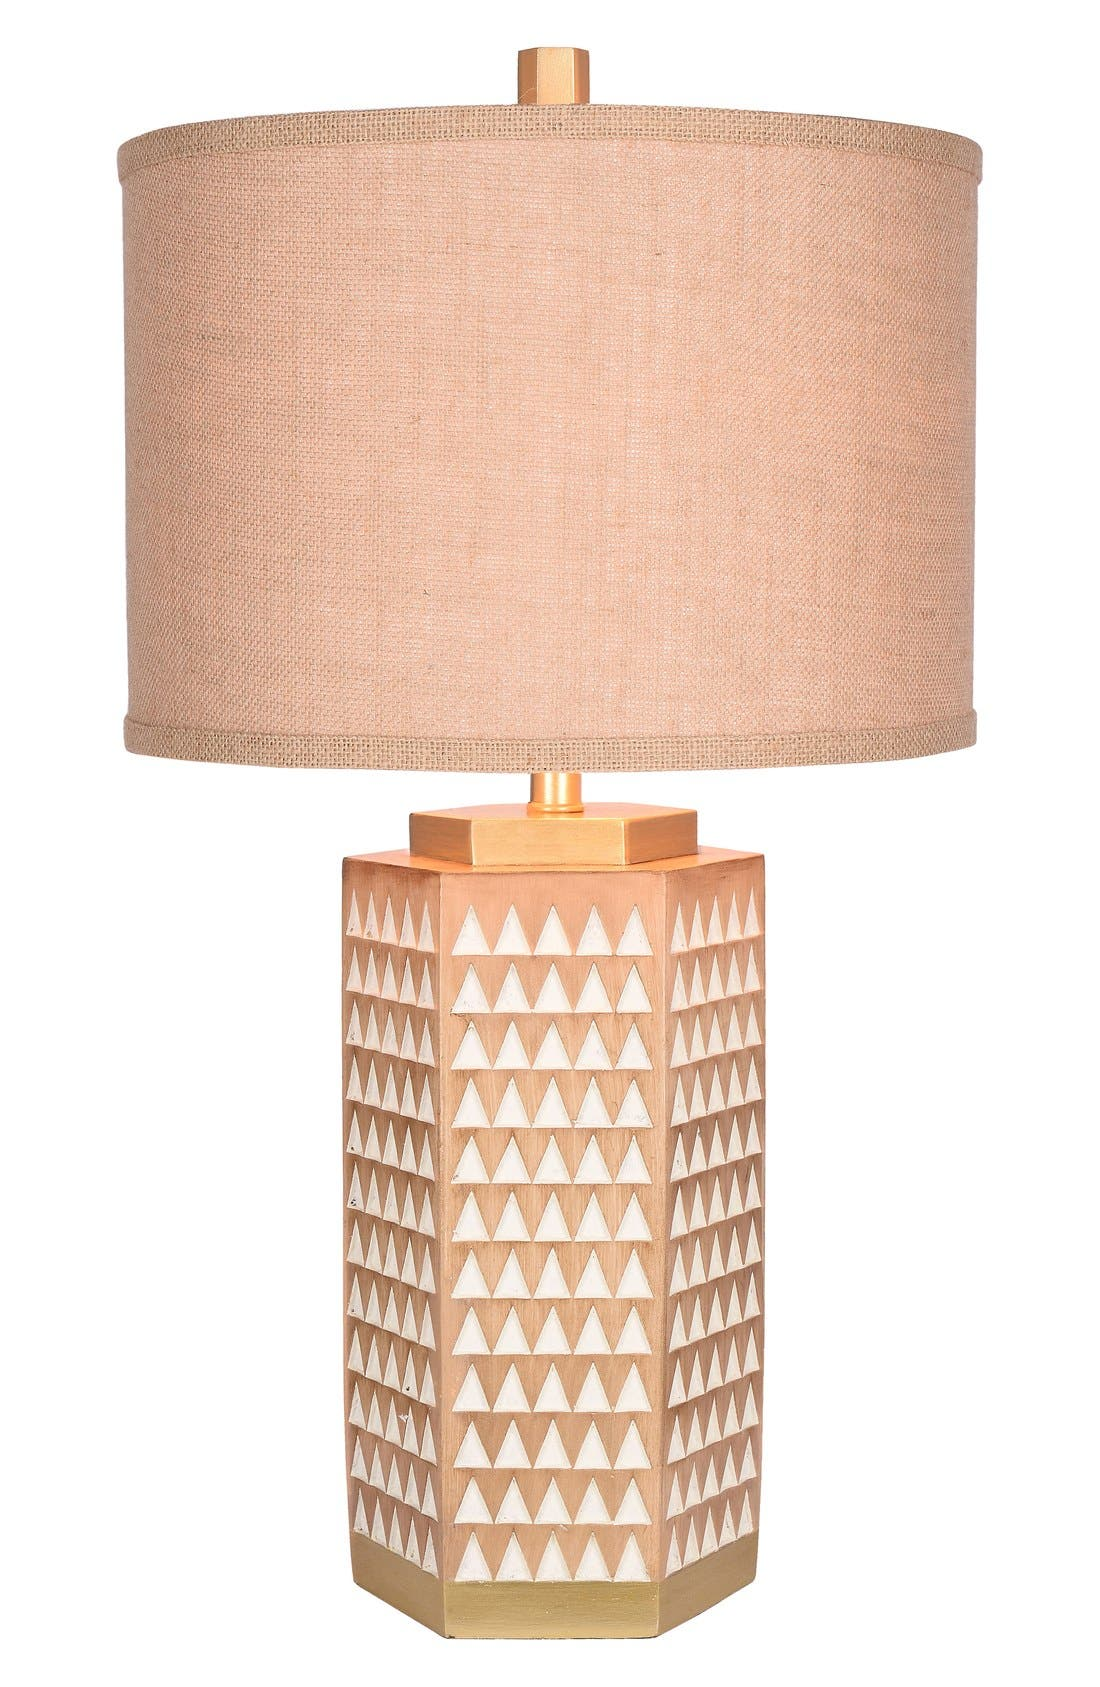 Alternate Image 1 Selected - JAlexander Kinsley Faux Wood Table Lamp